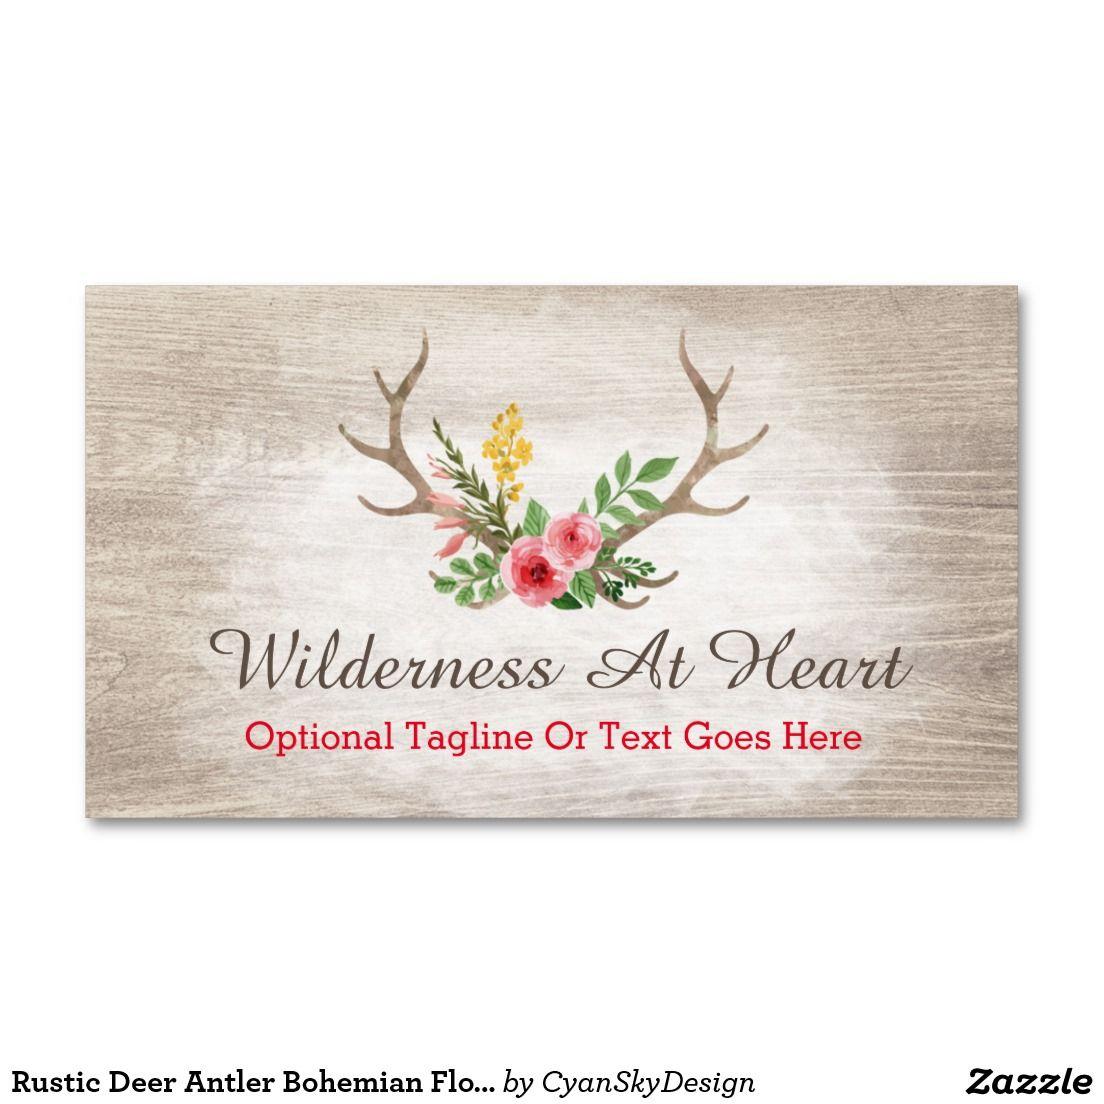 Rustic Deer Antler Bohemian Floral Watercolor Wood Business Card ...